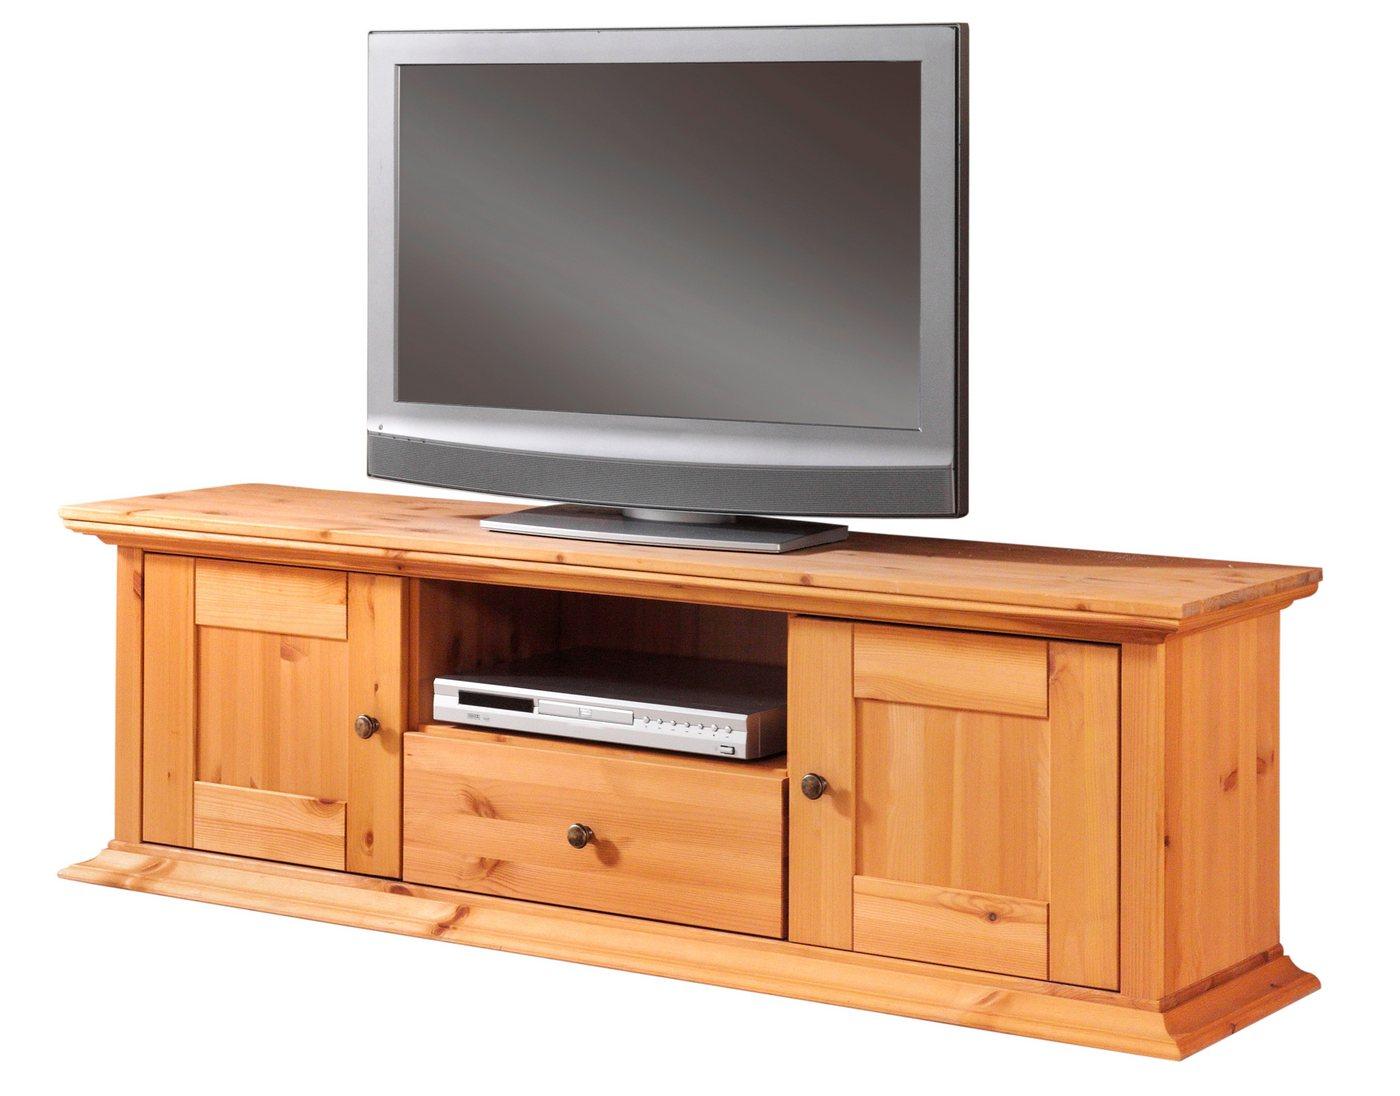 HOME AFFAIRE TV-meube , breedte 150 cm, draagvermogen tot 75 kg